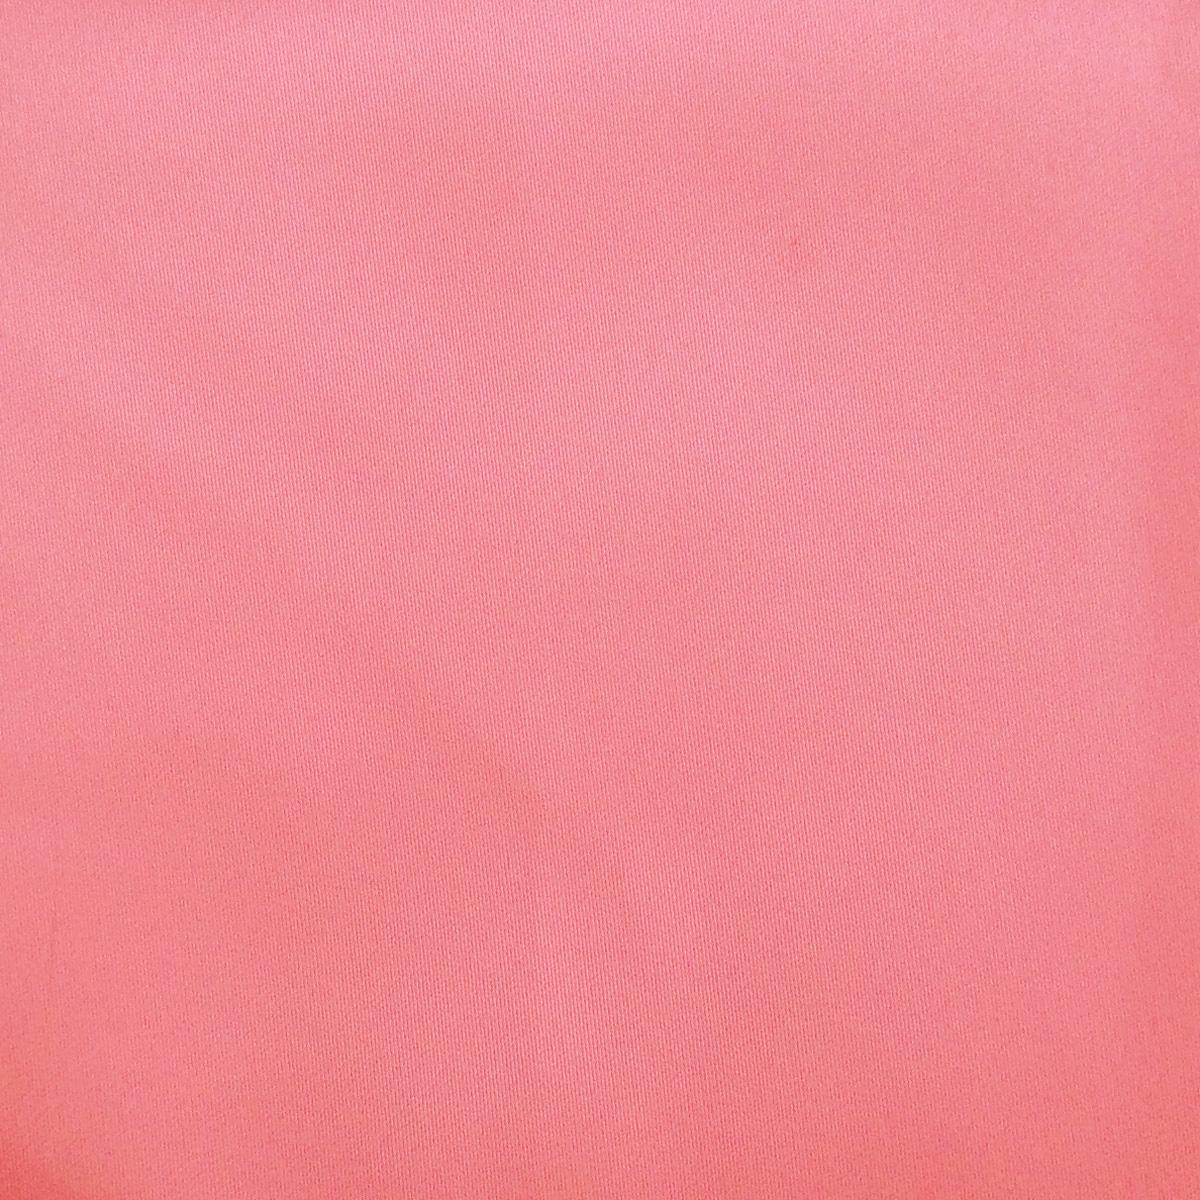 B1764 26 dark pink mens ties facemasks con murphys menswear cork - - Con Murphys Menswear